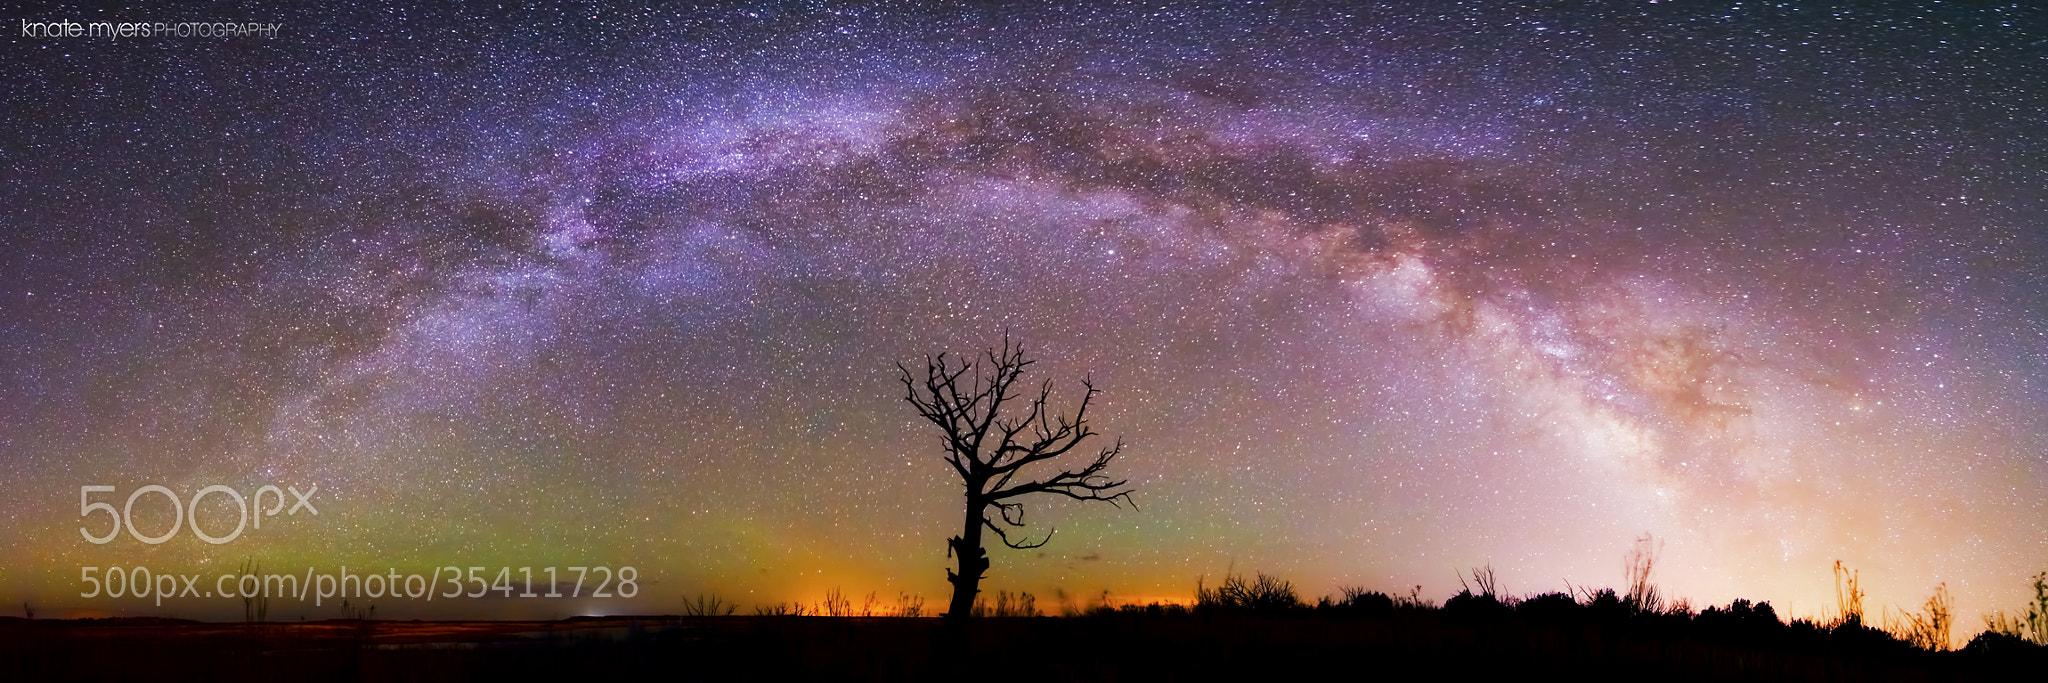 Photograph MilkyWay Panorama - Bridge Across the Sky by Knate Myers on 500px